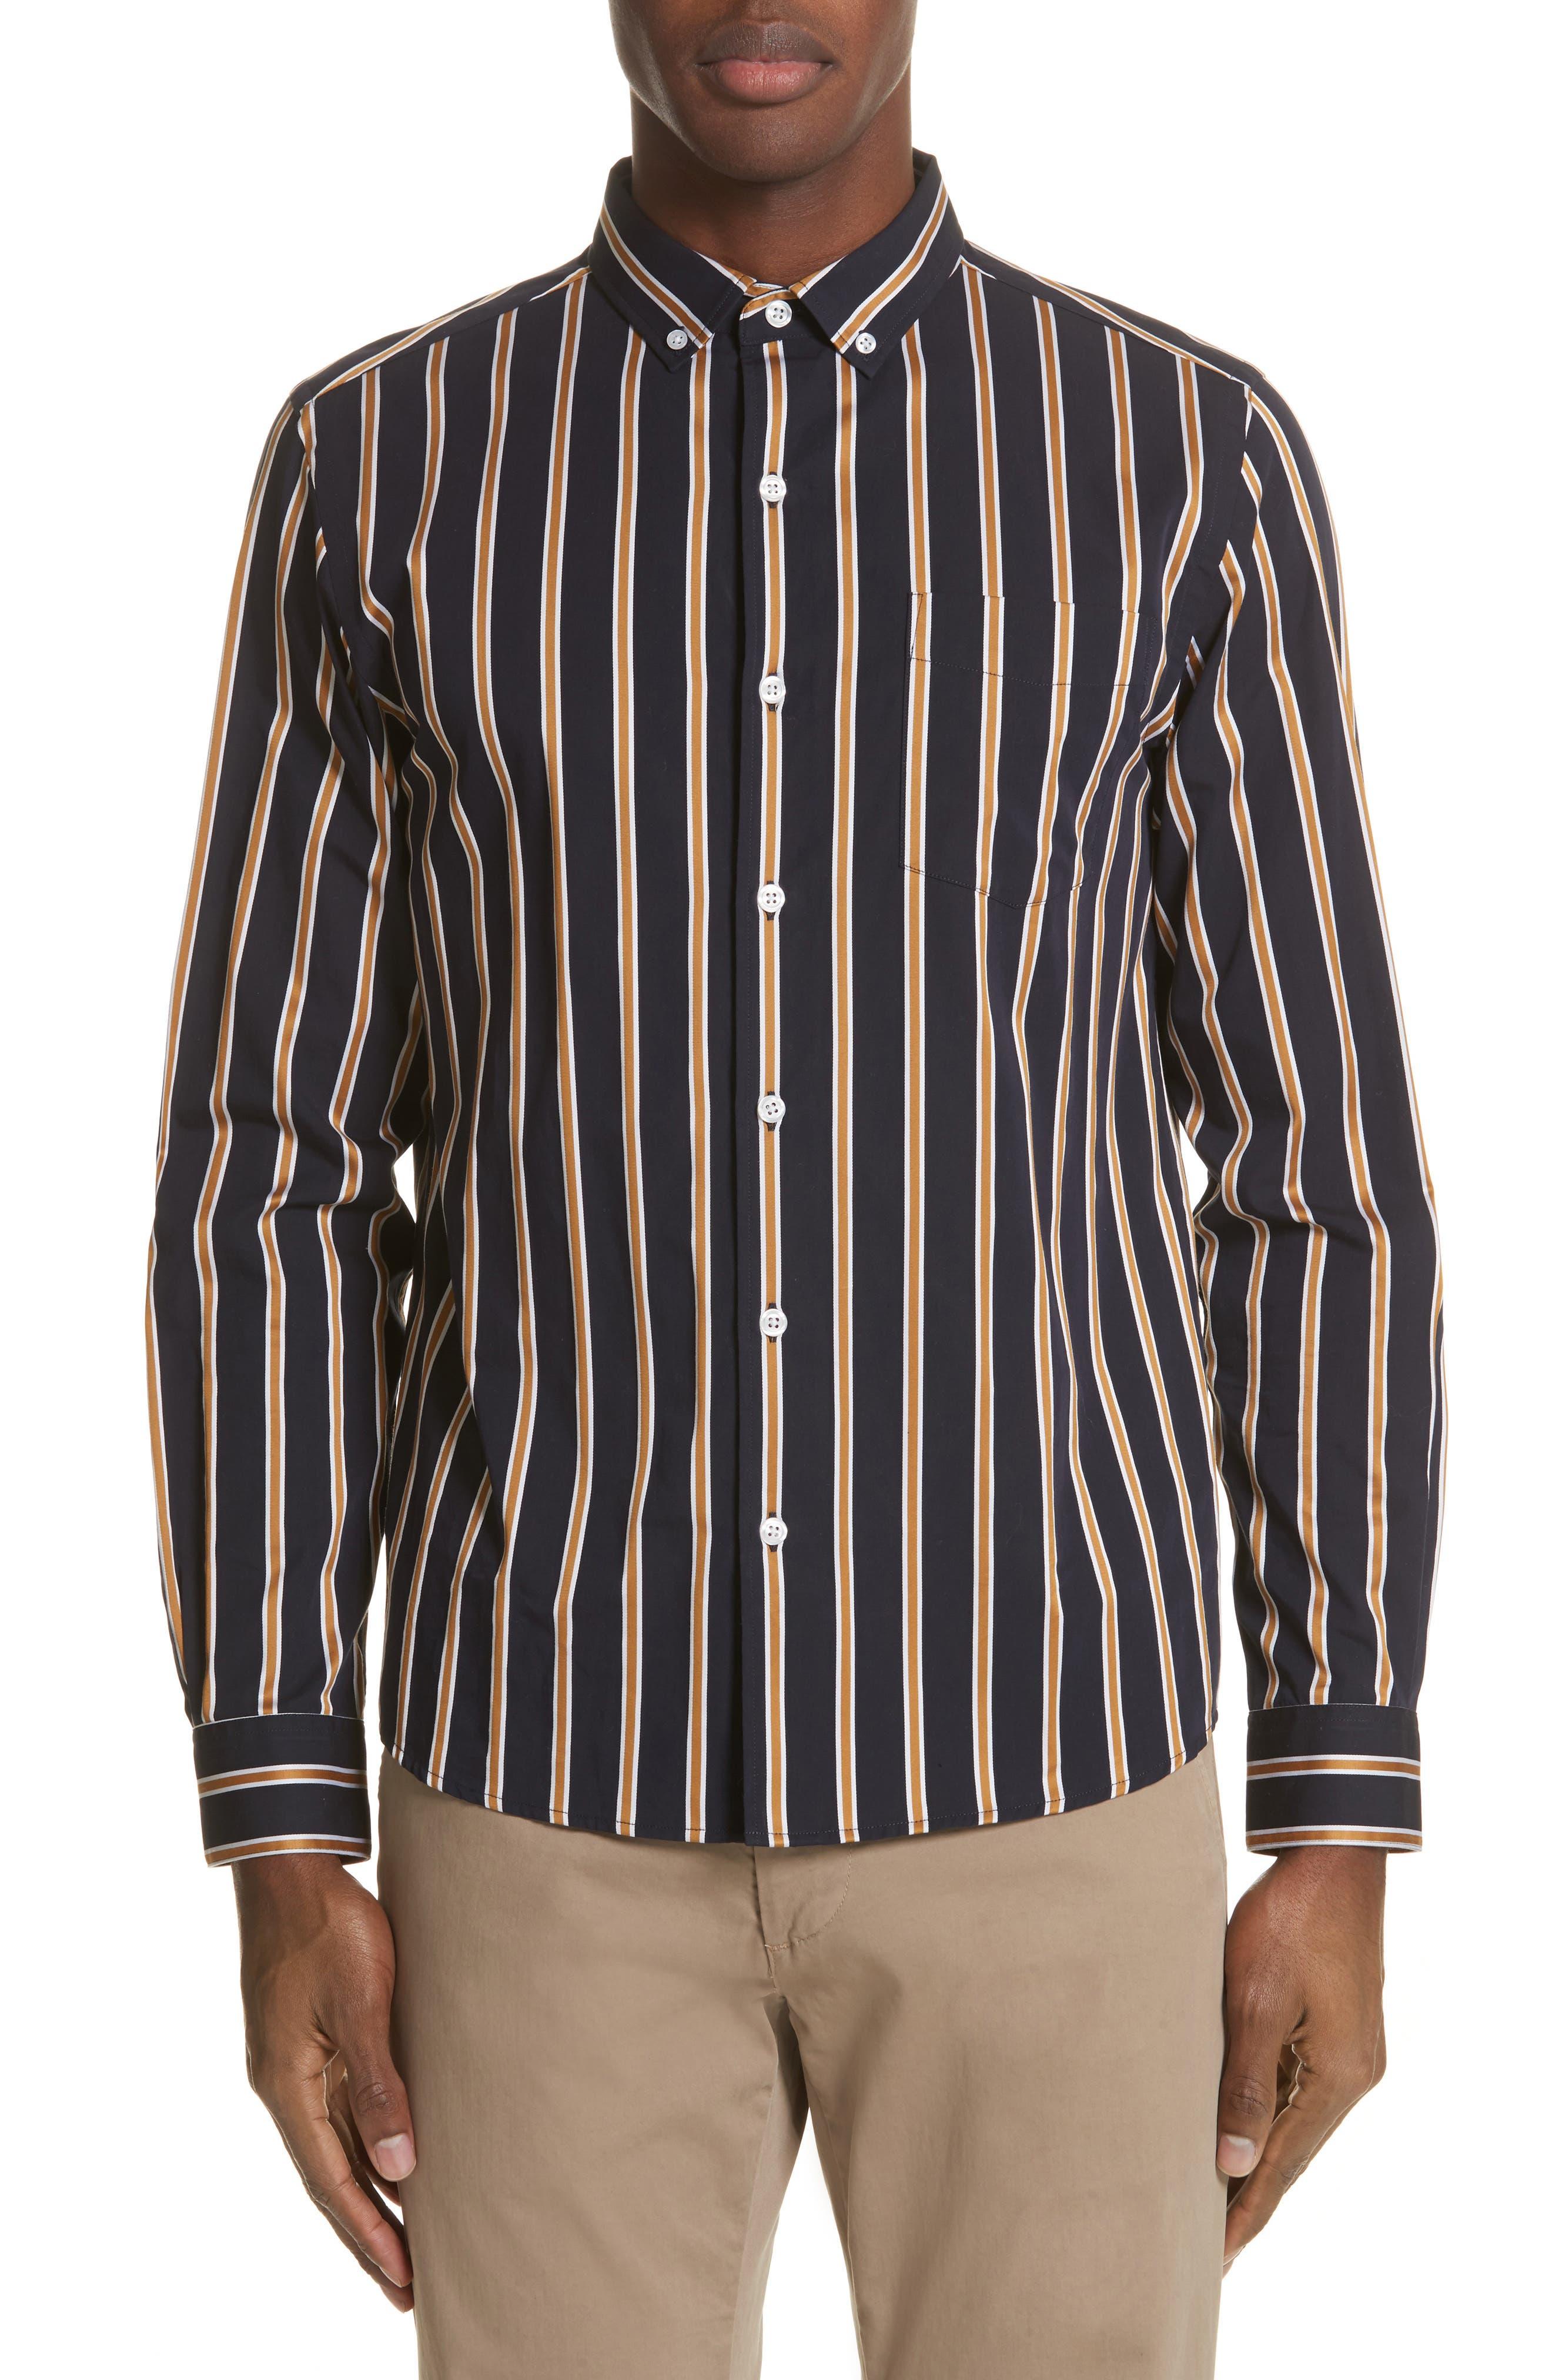 Alternate Image 1 Selected - Saturdays NYC Crosby Satin Stripe Shirt